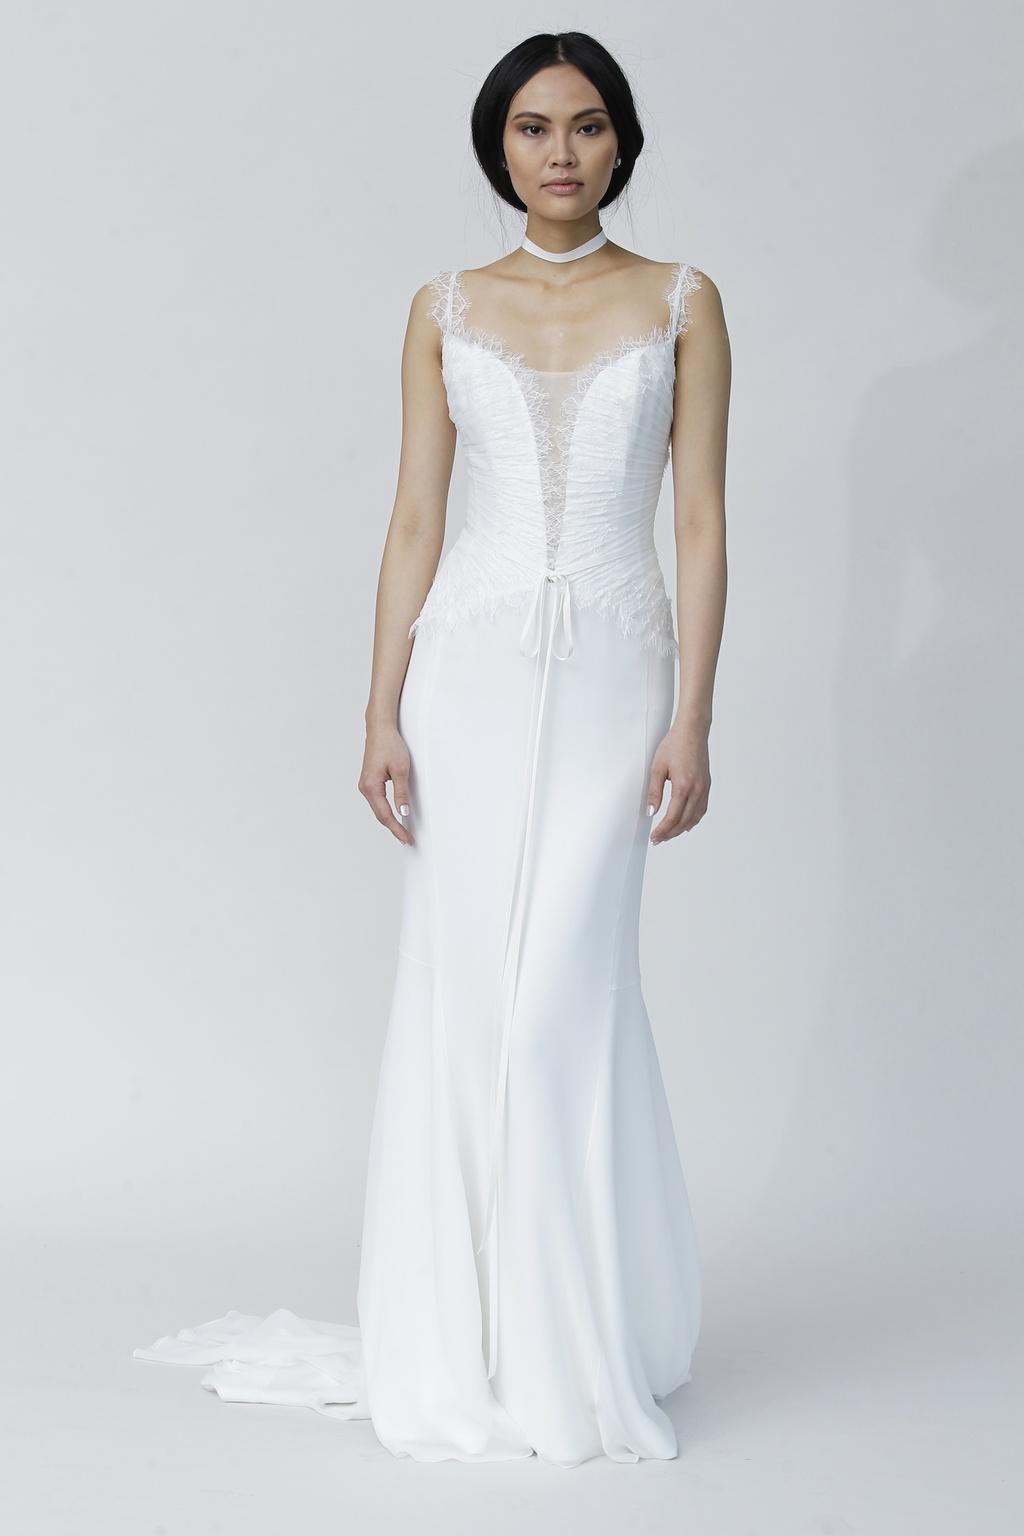 Paola-wedding-dress-by-rivini-fall-2014-bridal.full